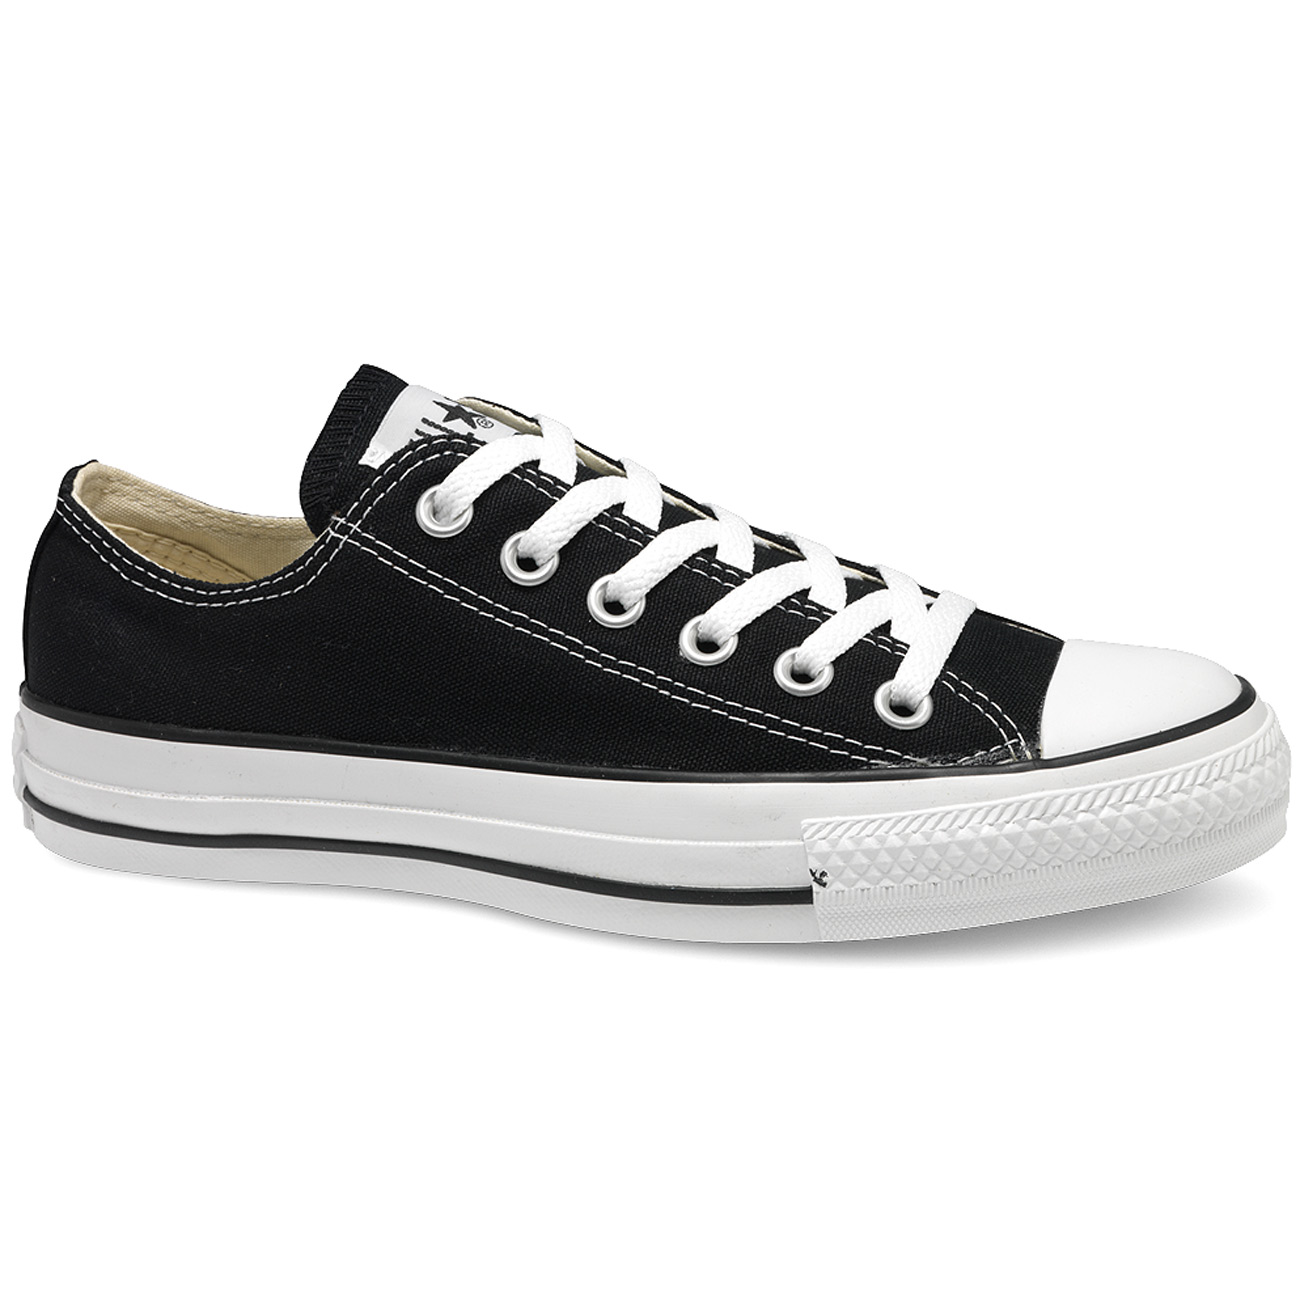 Converse All Star Ox schwarz (black)